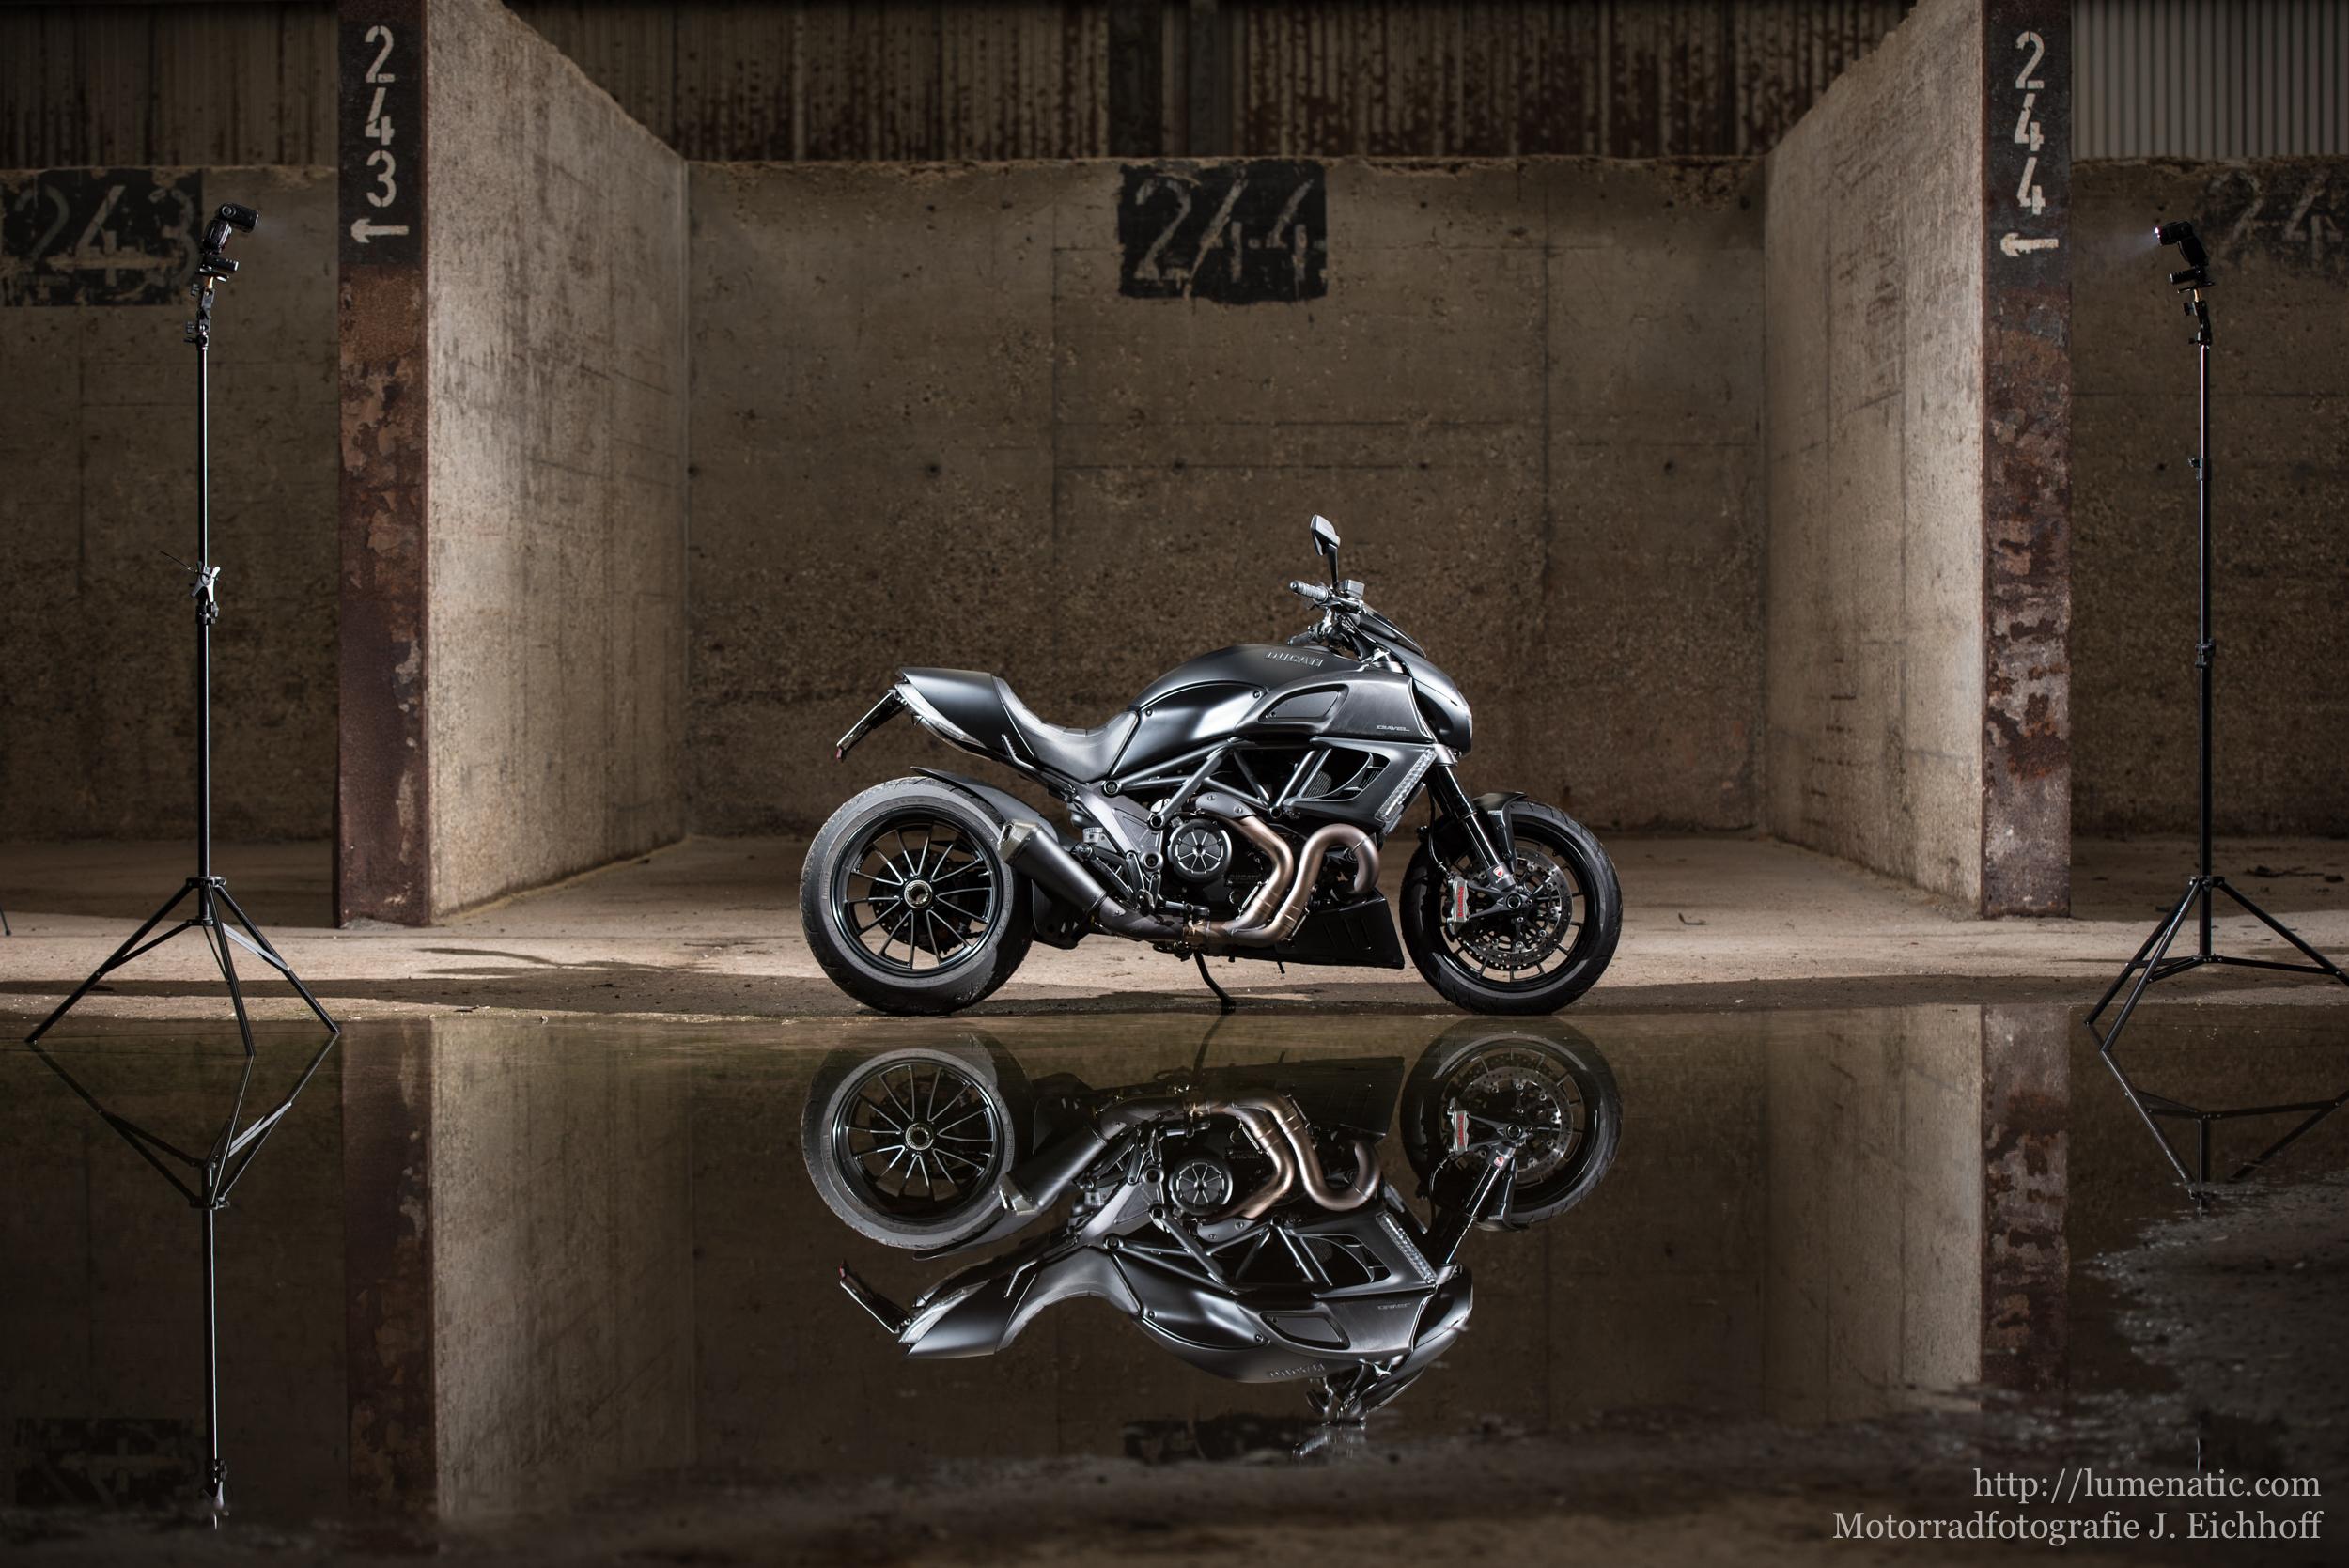 Alte Gießerei, Teil 1: Ducati Diavel